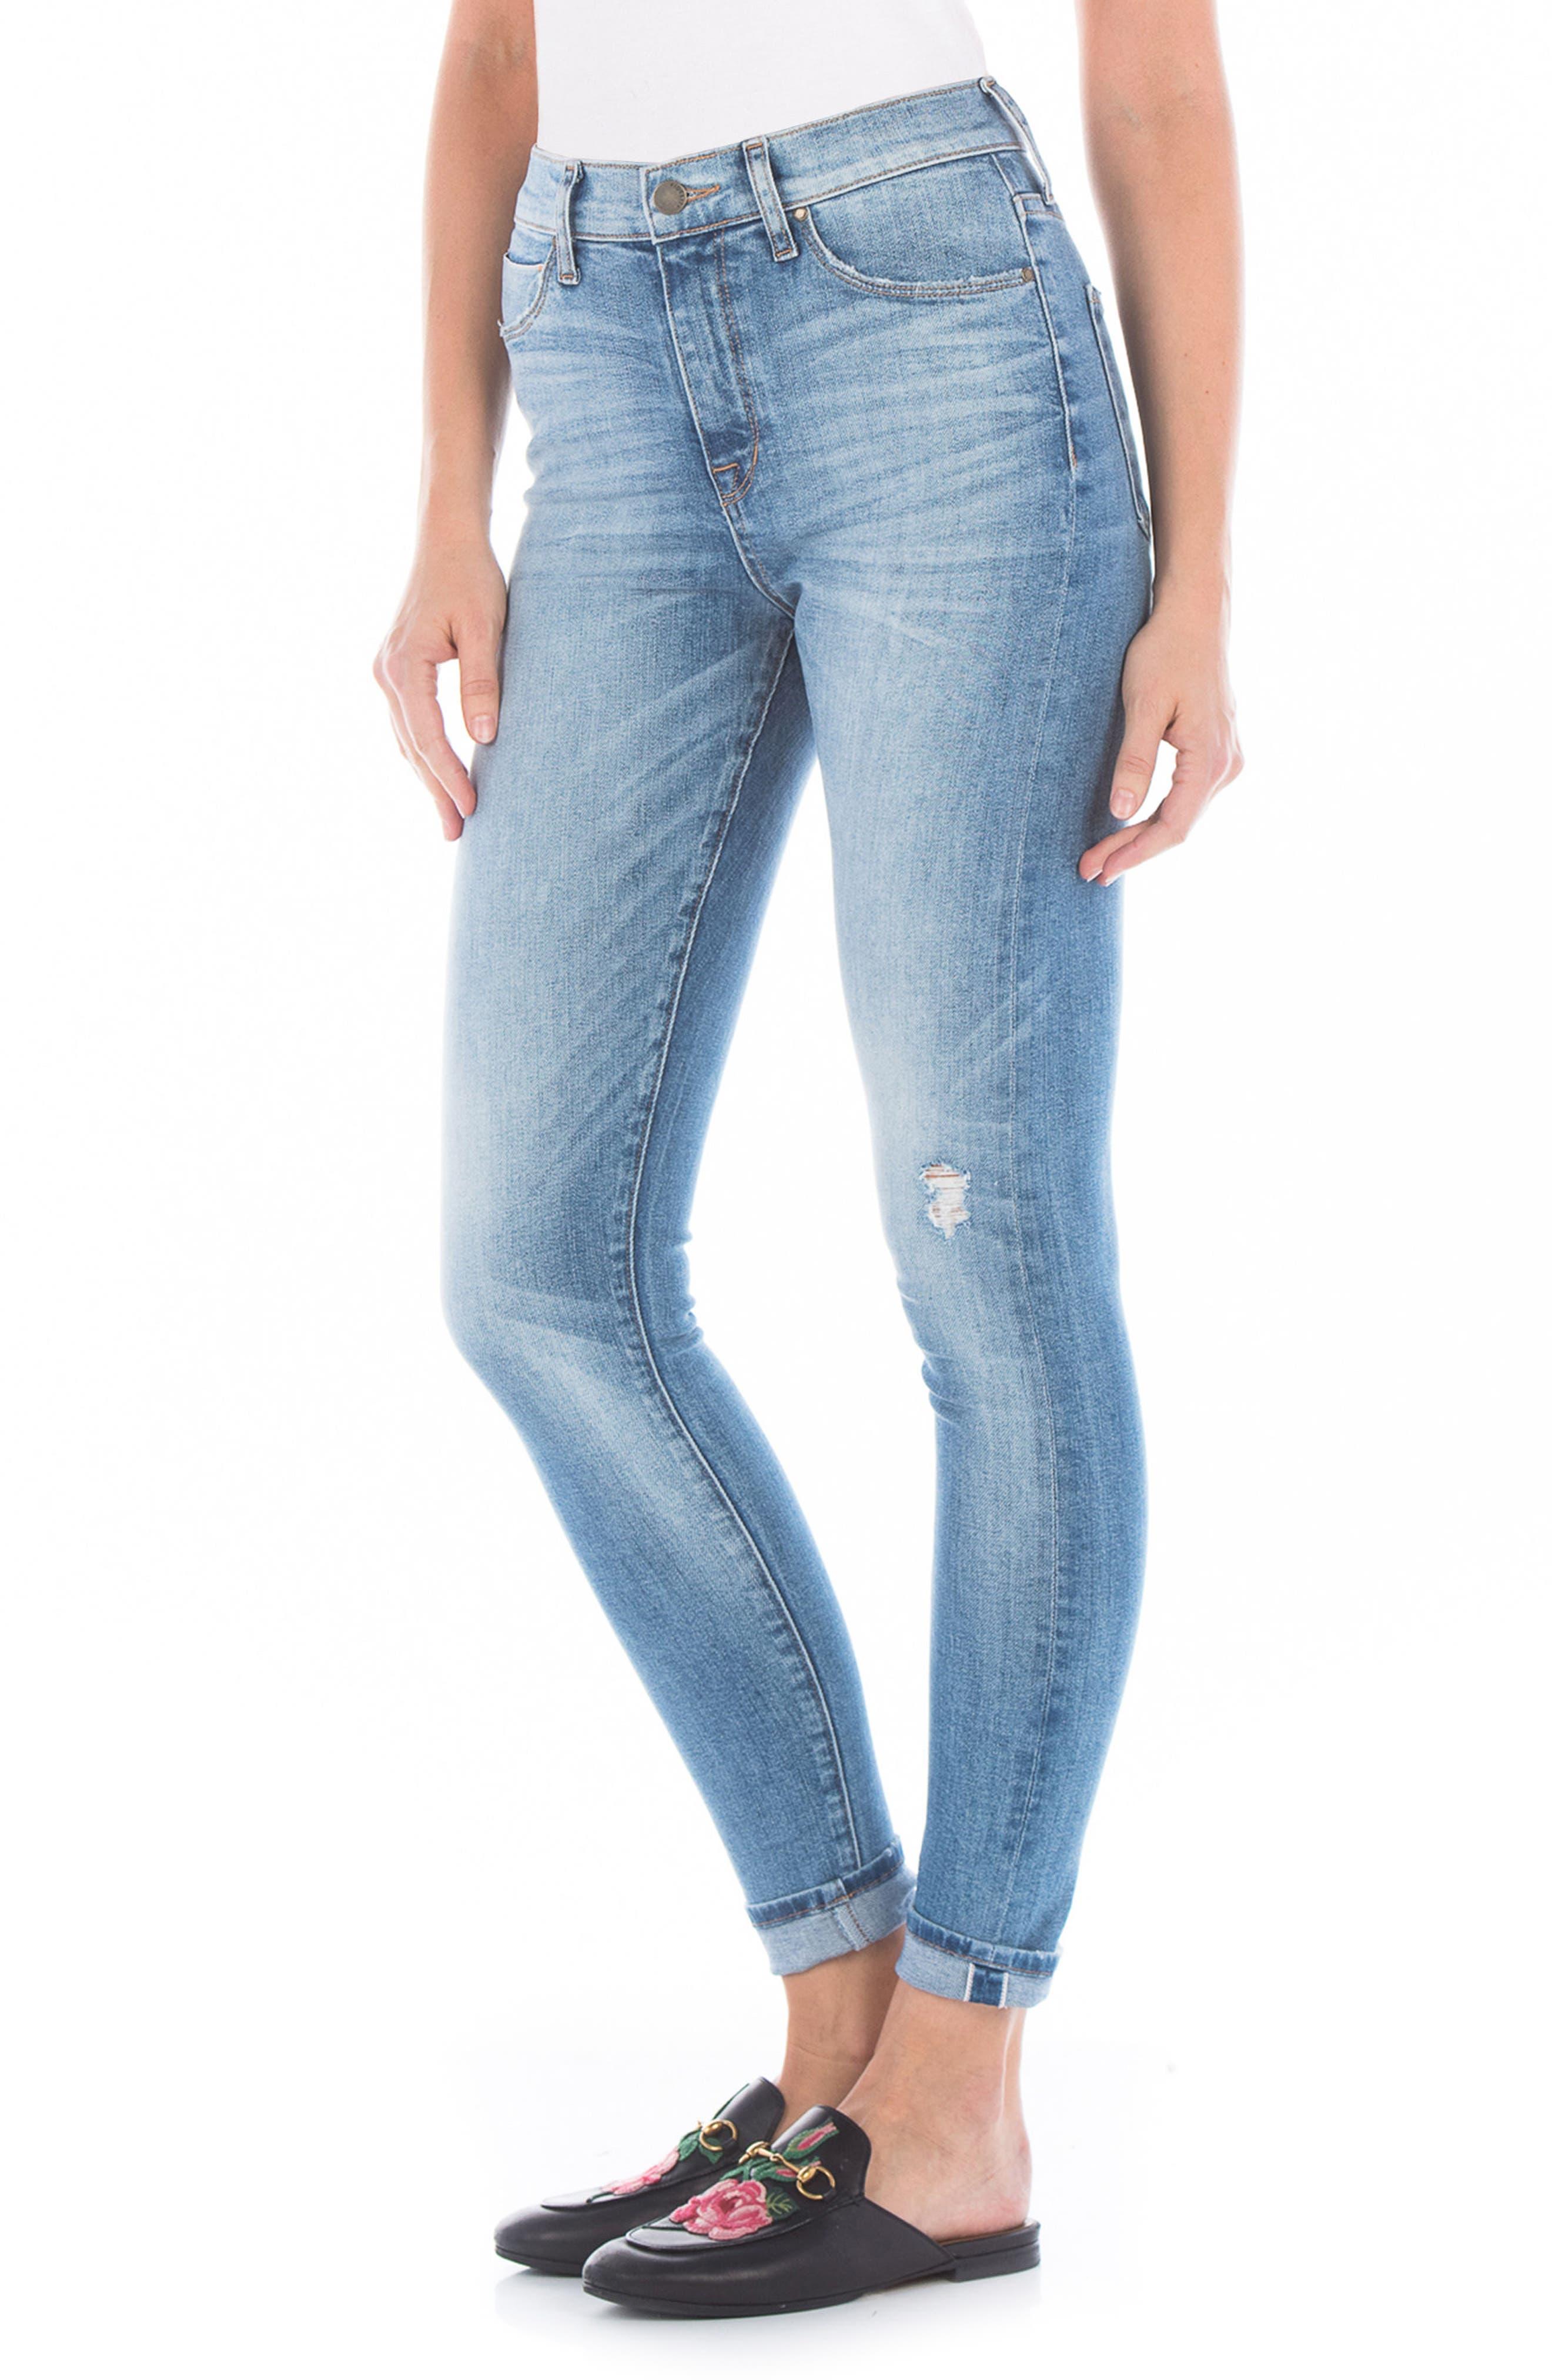 Gwen High Waist Skinny Jeans,                             Alternate thumbnail 3, color,                             76 SUMMER